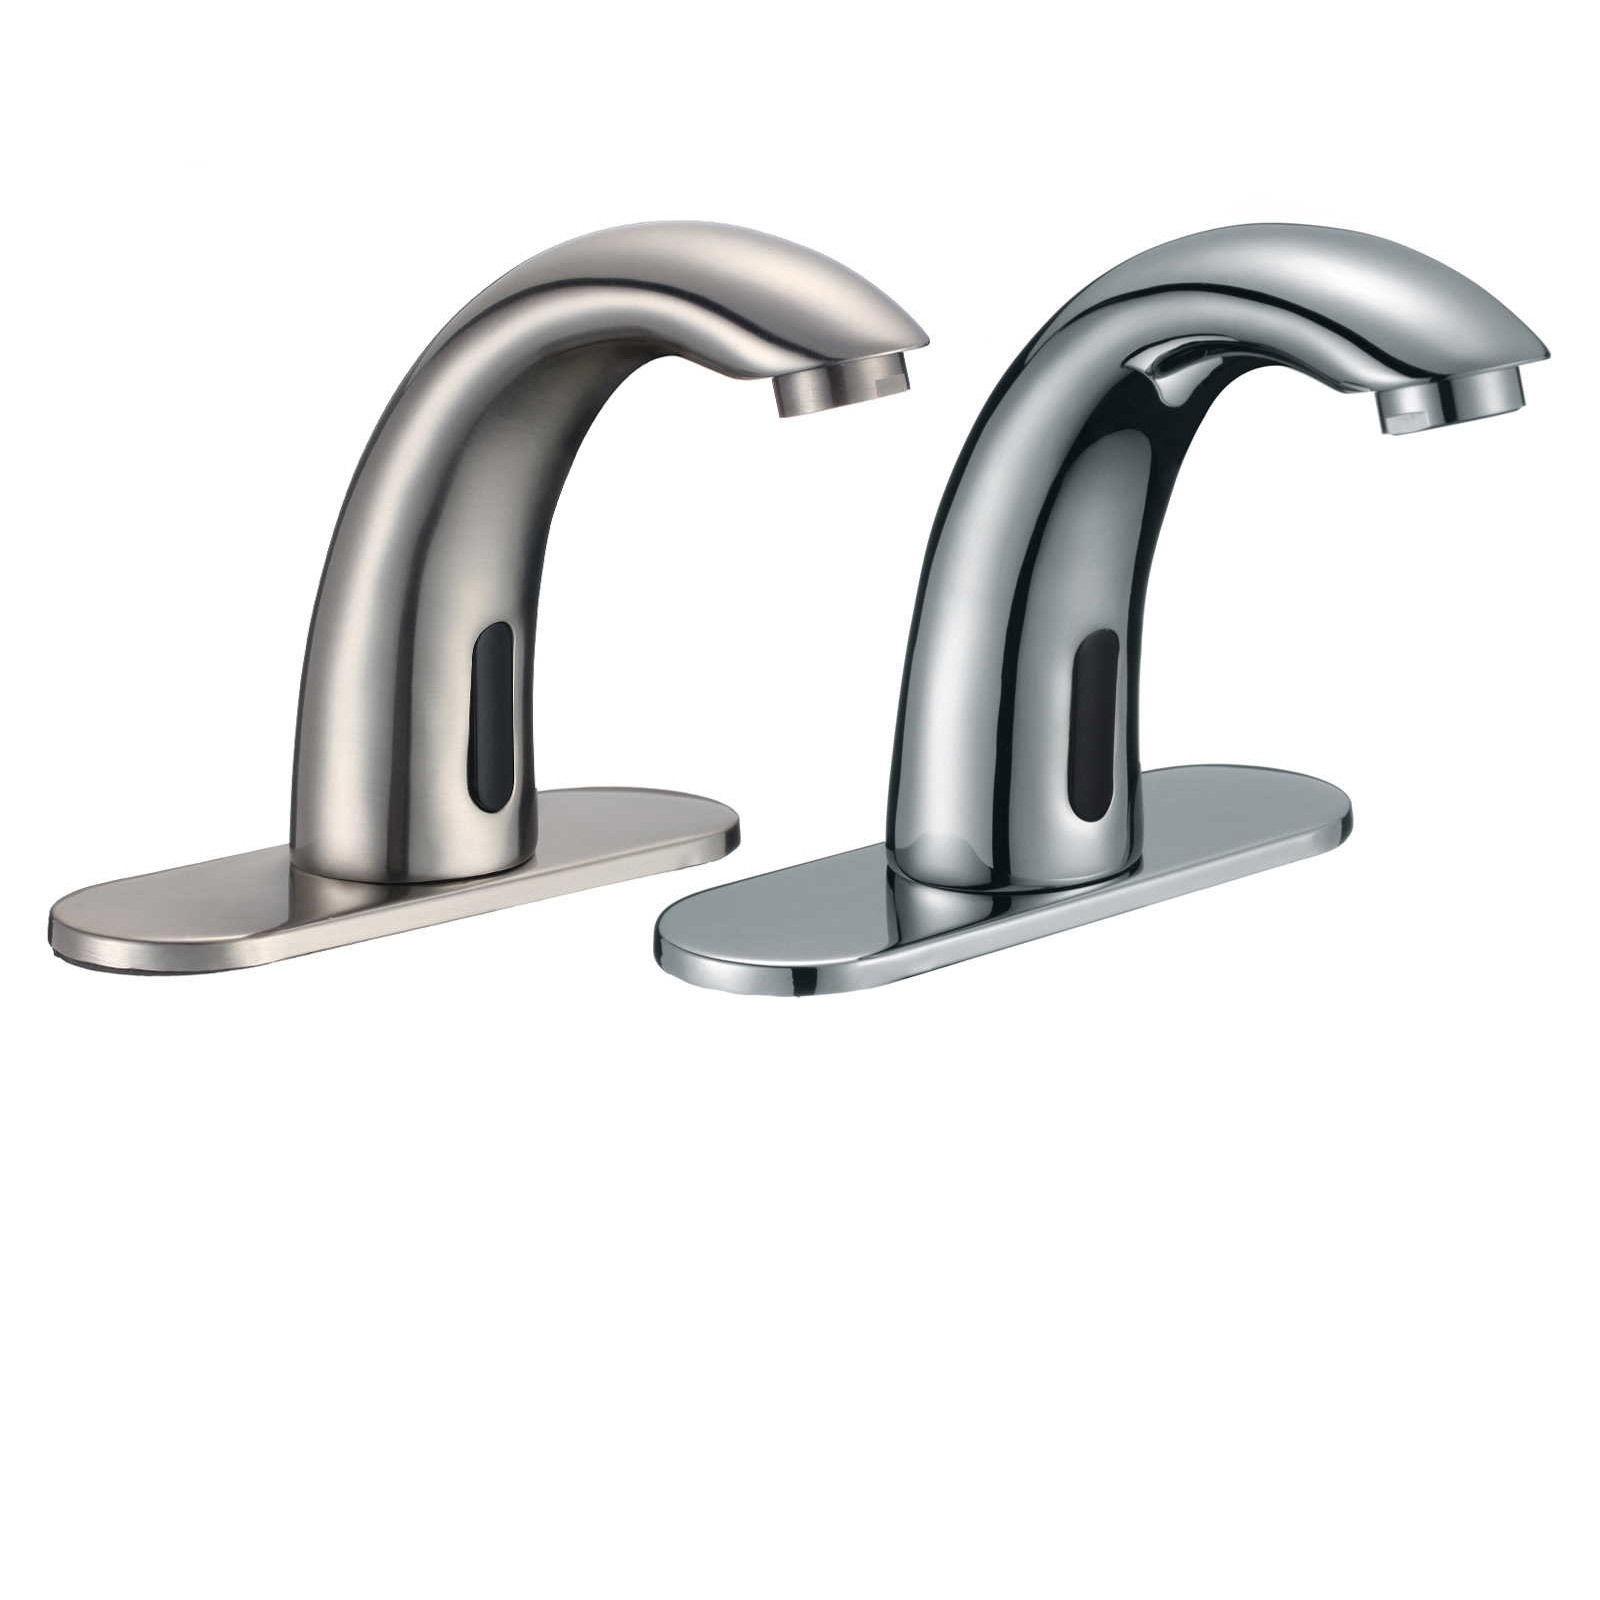 Lano Solid Brass Chrome Finish Sensor Faucet